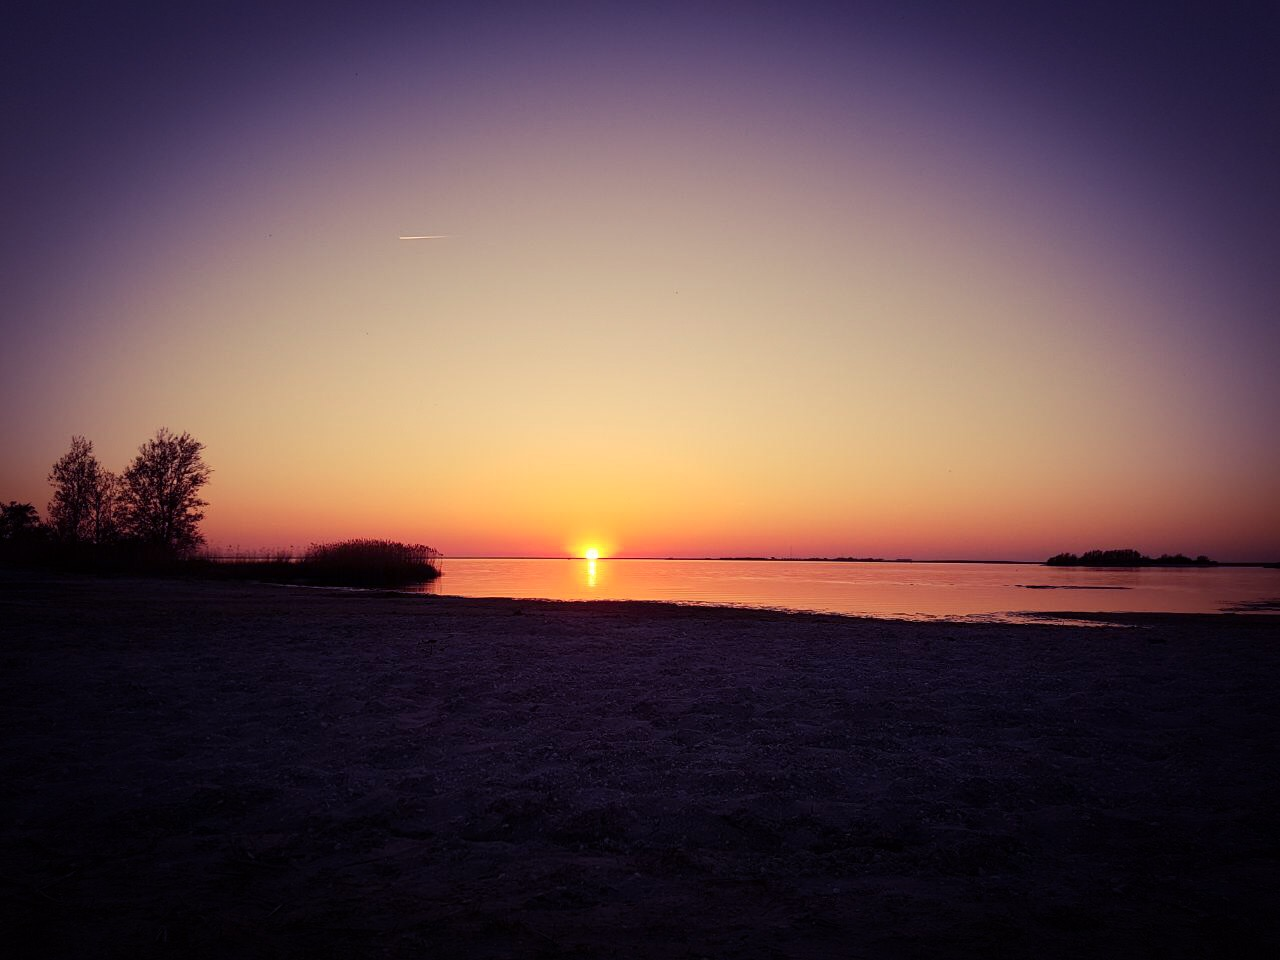 RWB Essen - Surfwoche in Makkum 2018 - Sonnenuntergang am Meer